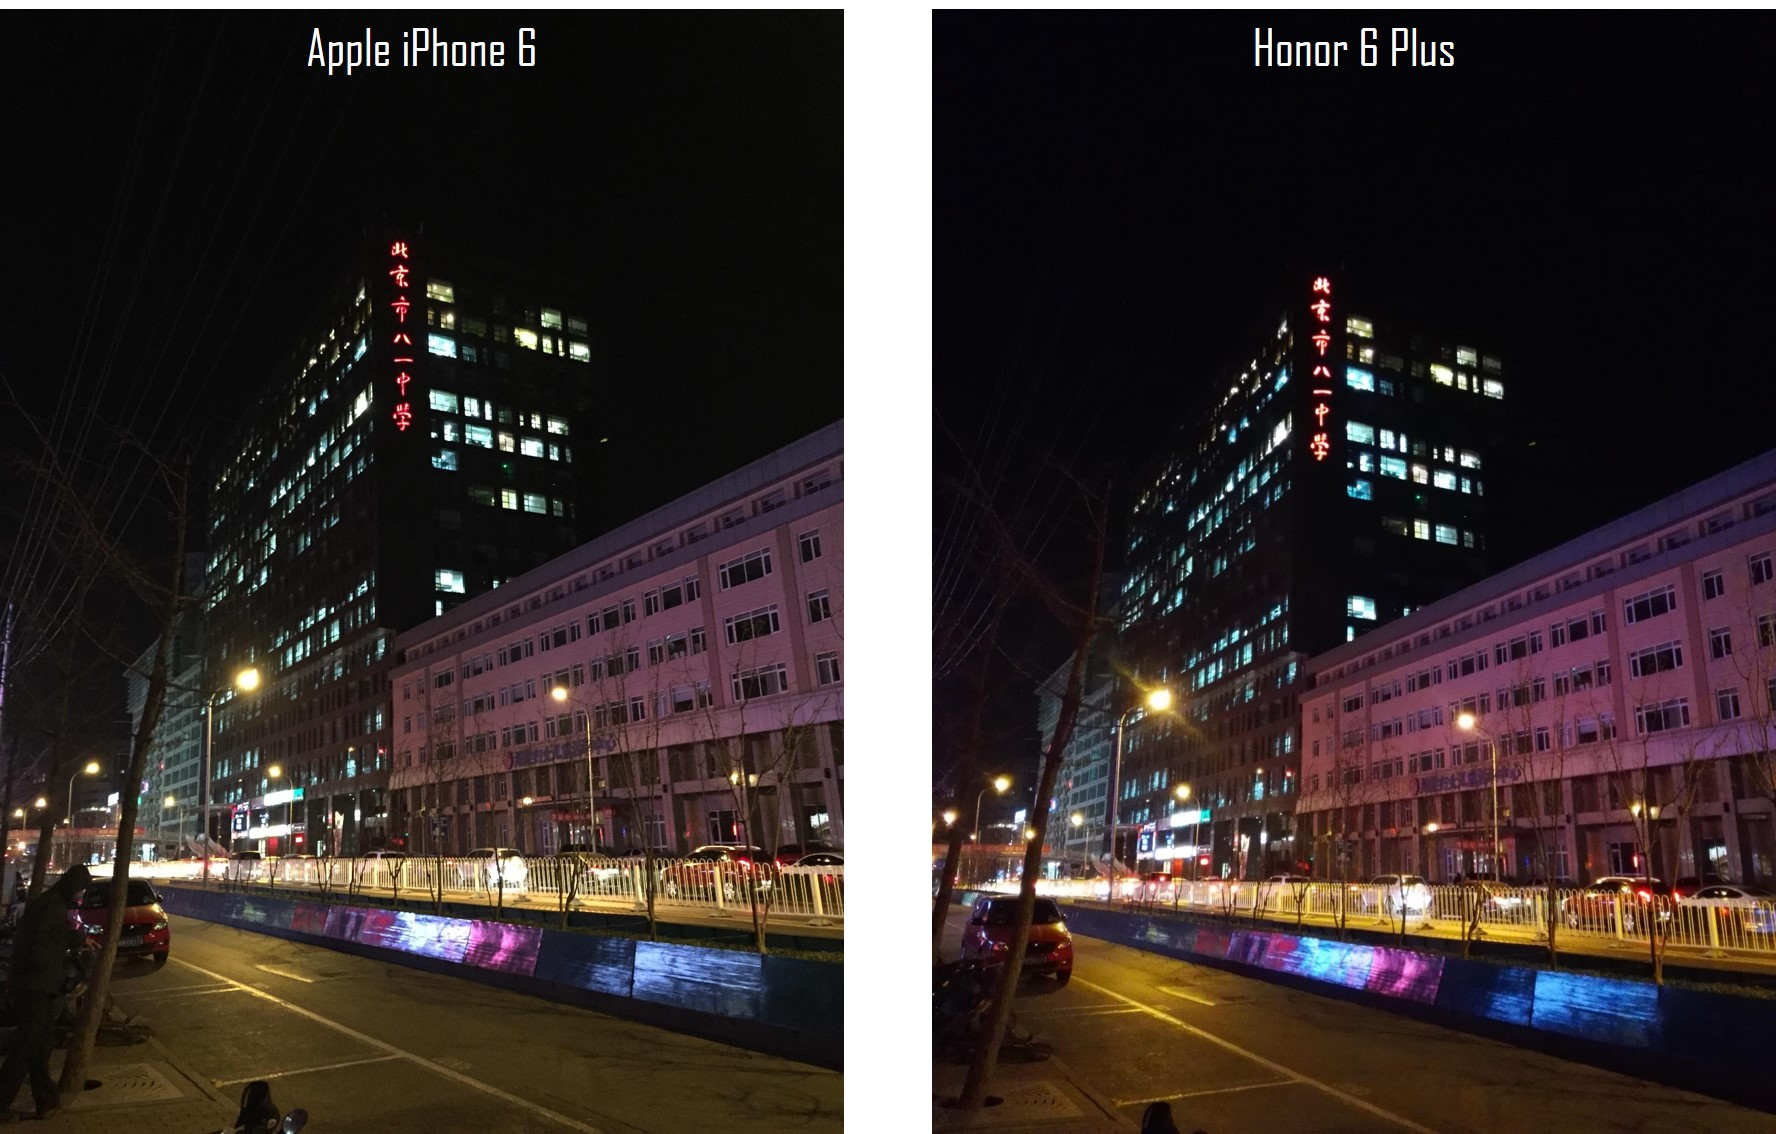 Comparativo_Honor_iPhone_1